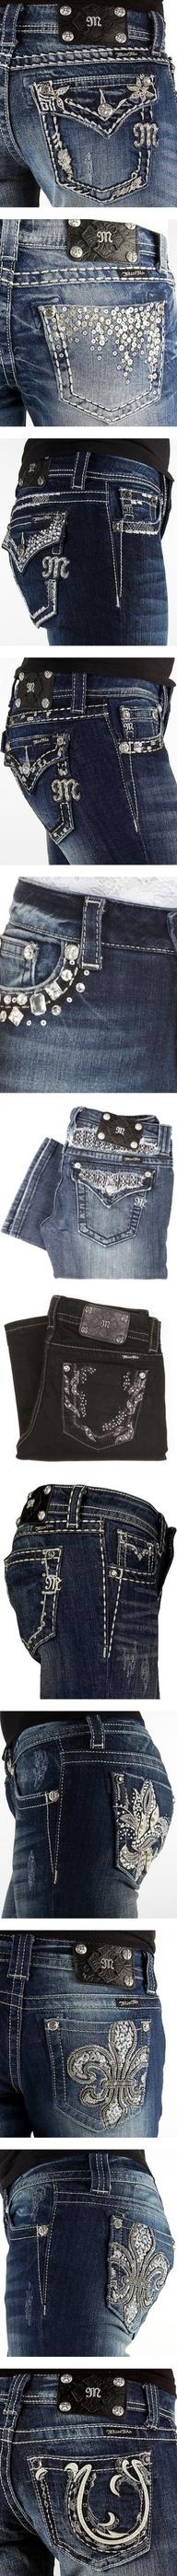 #Designer #Jeans loveee them.... so comfy